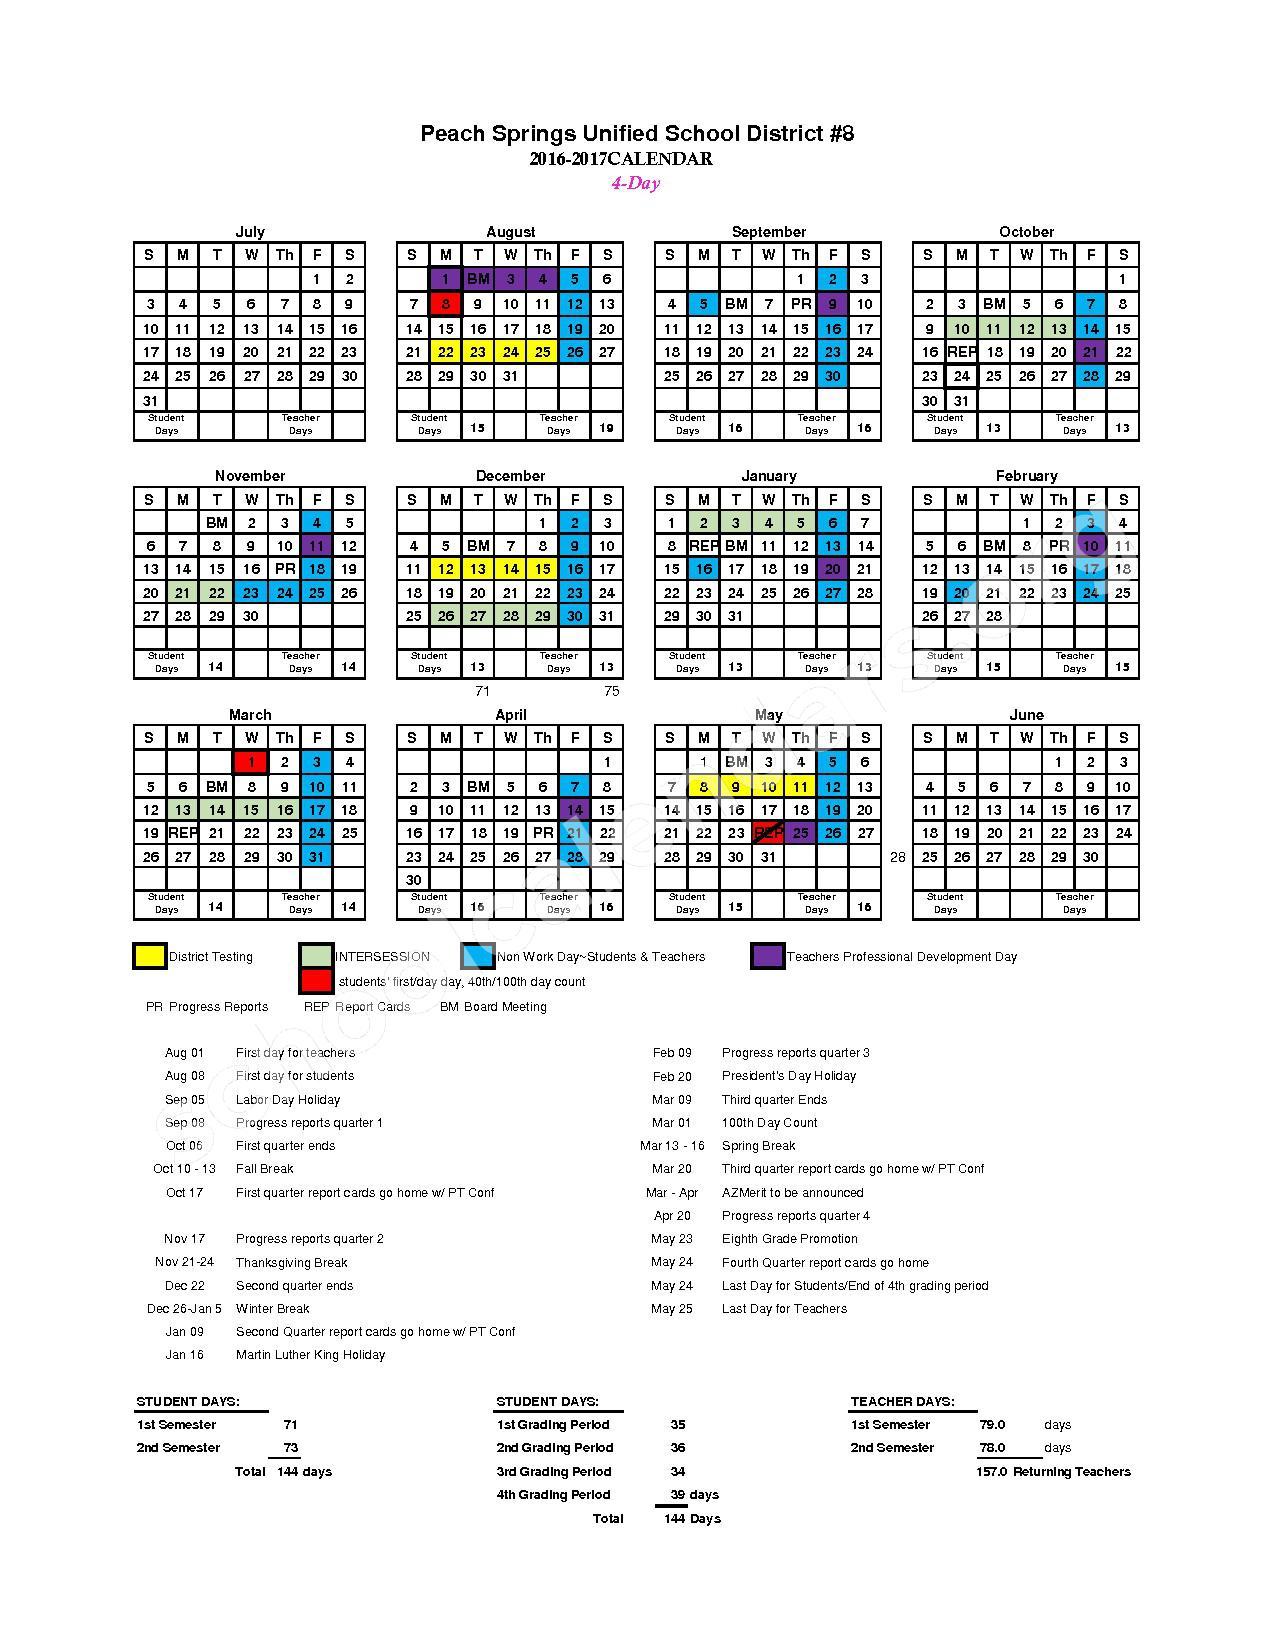 Peach Springs School Year Calendar 2016 - 2017 – Peach Springs Unified School District #8 – page 1